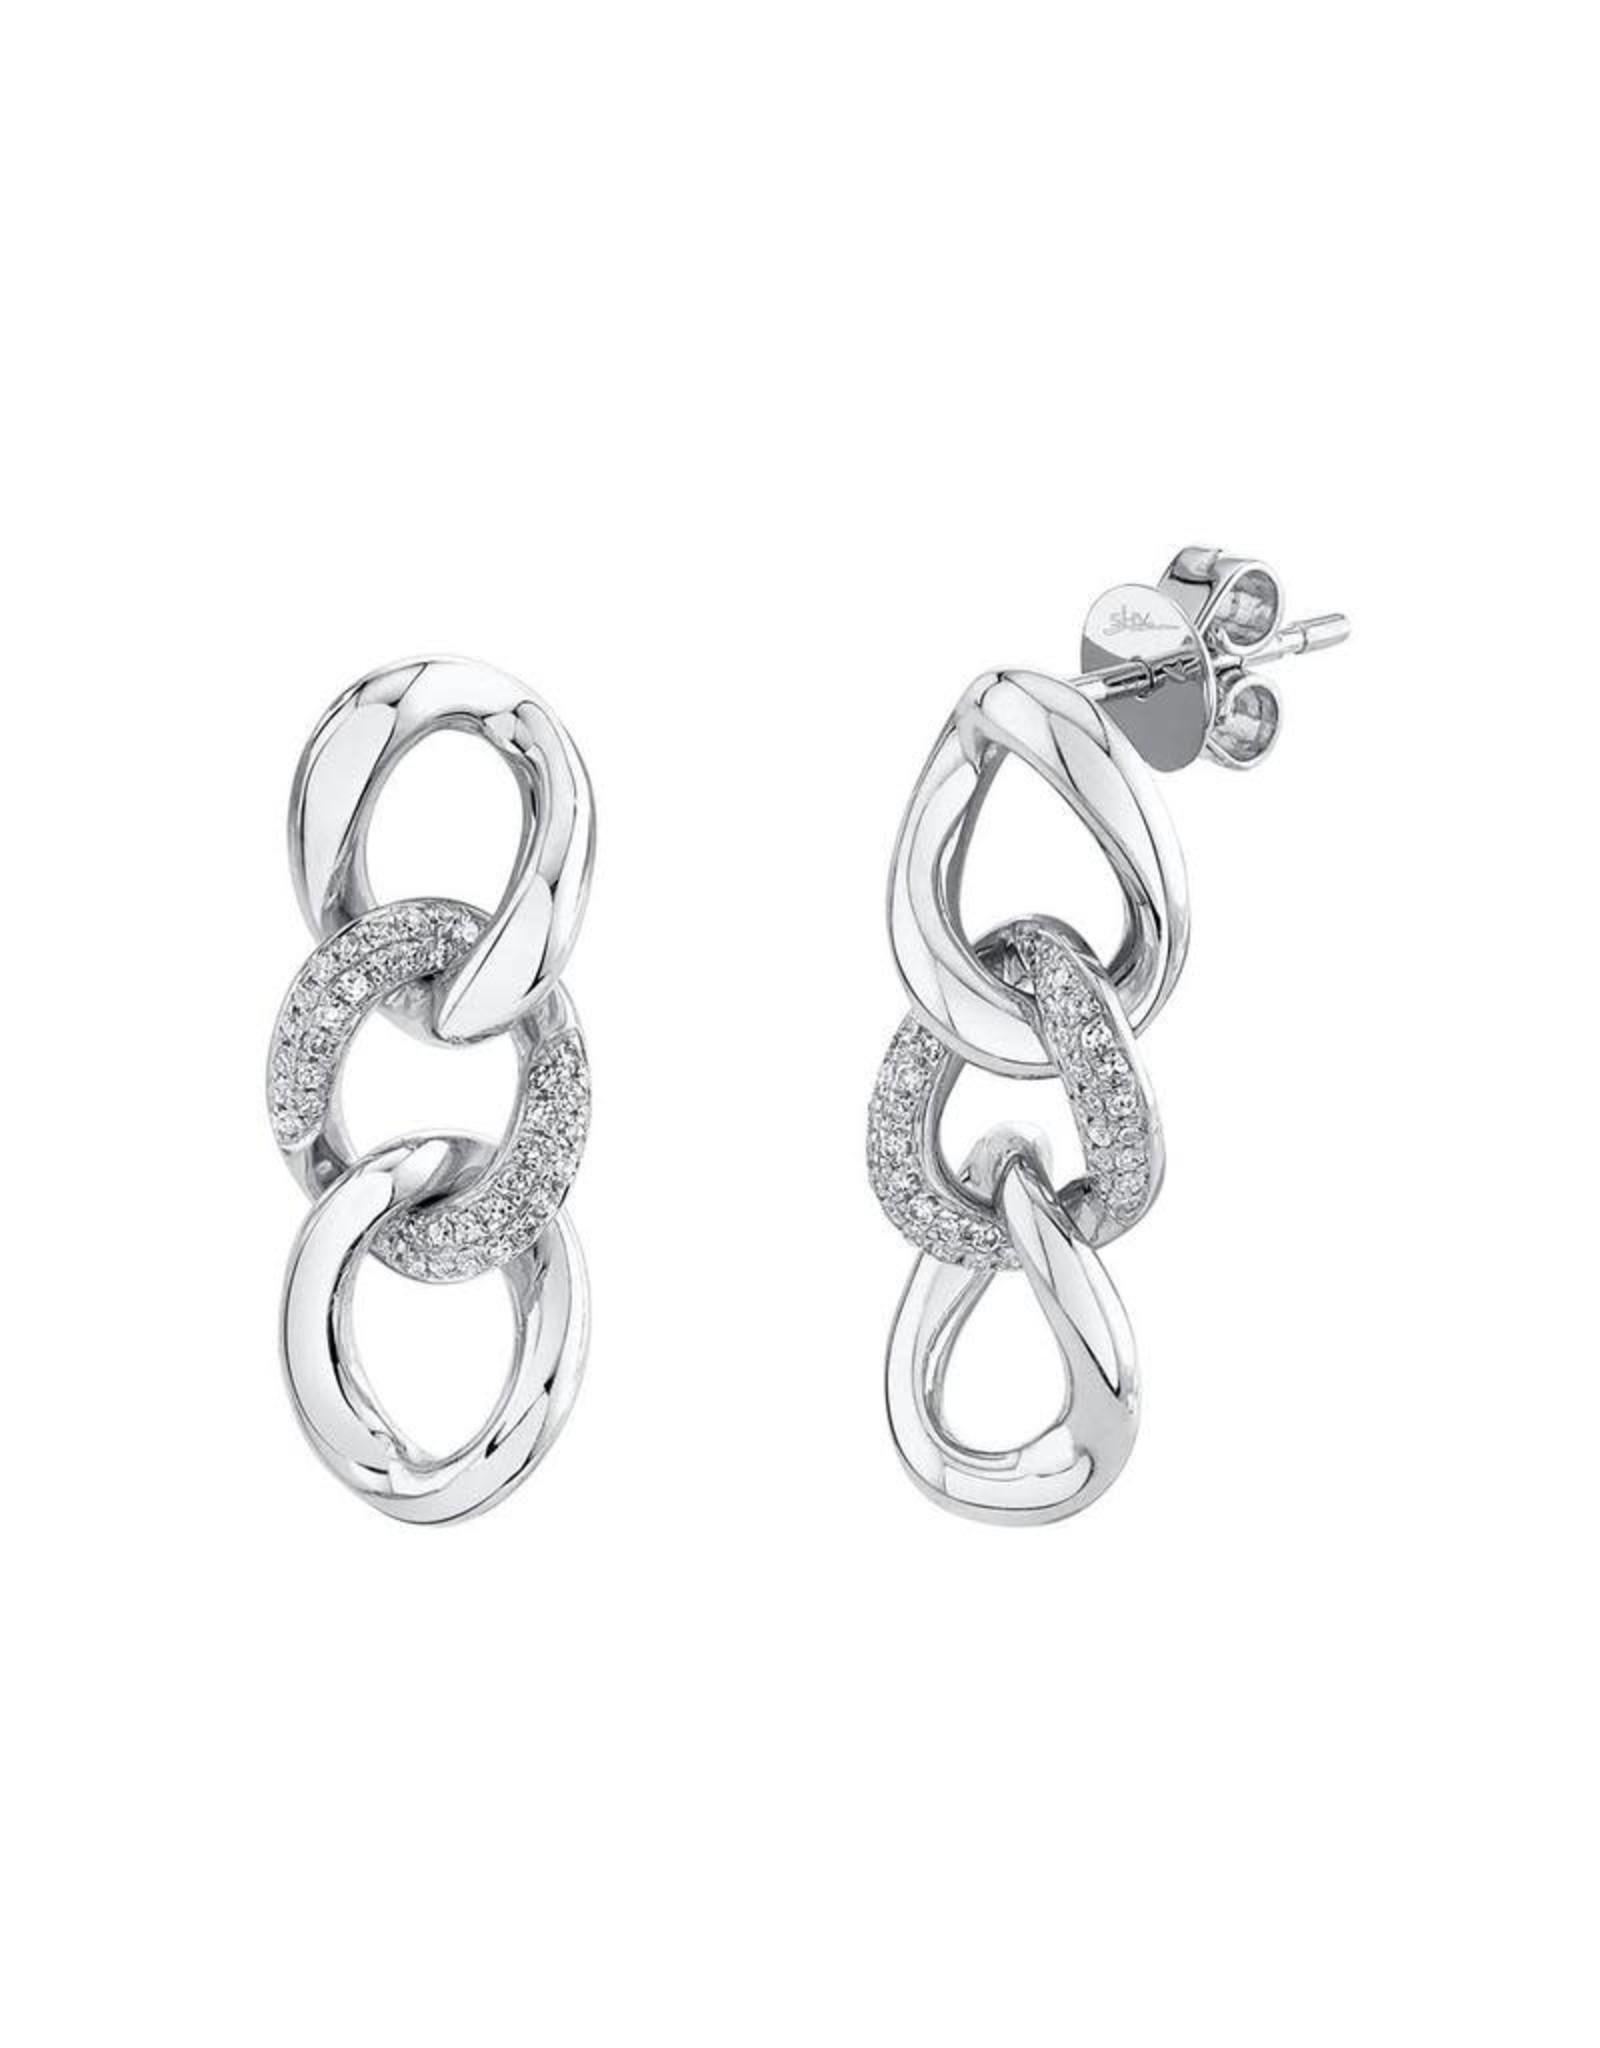 14K White Gold Diamond Curb Link Chain Earrings, D: 0.18ct